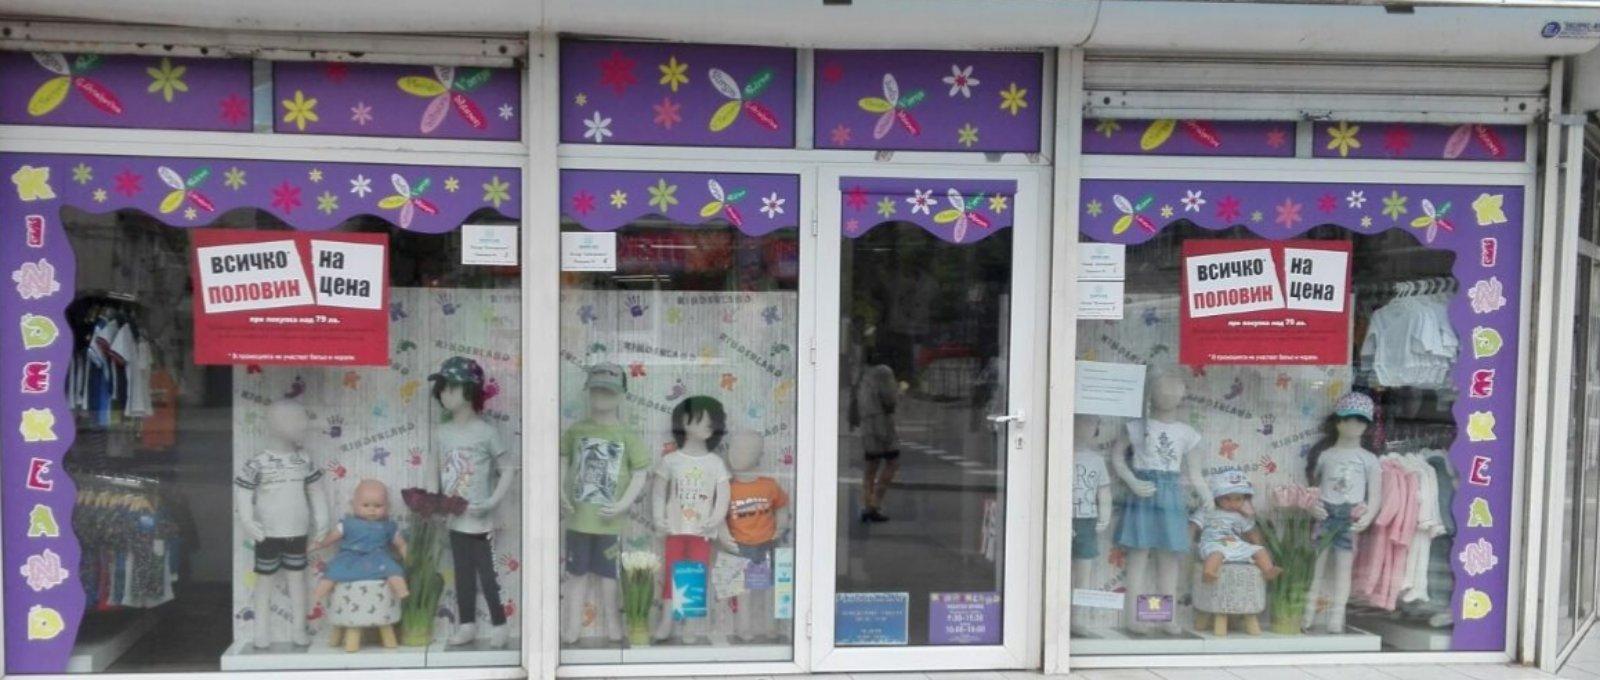 Детски магазин Варна Киндерланд Колхозен пазар